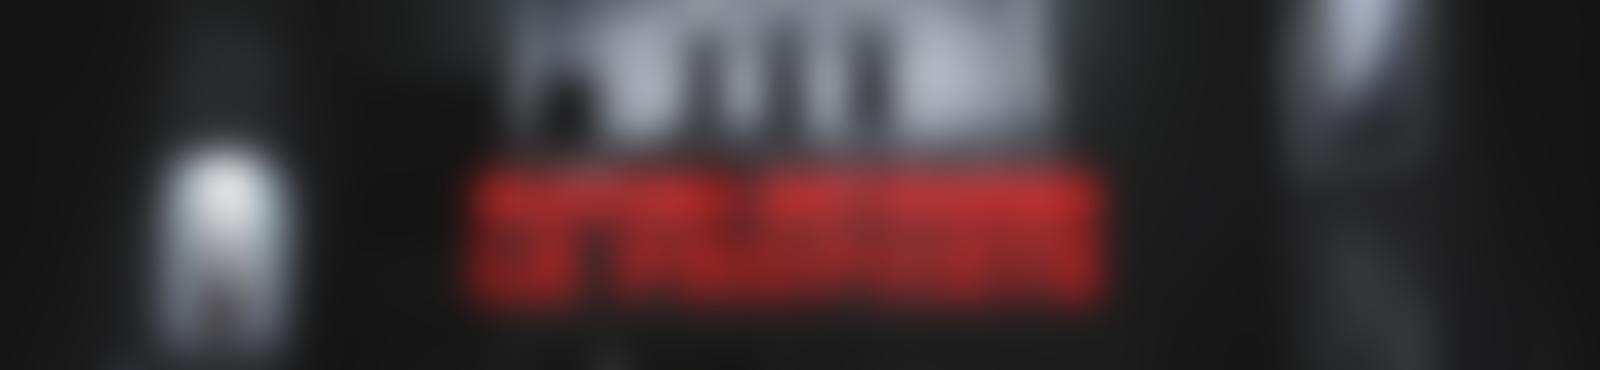 Blurred 9c220151 8f87 4d28 8e17 5301c38e1e8c